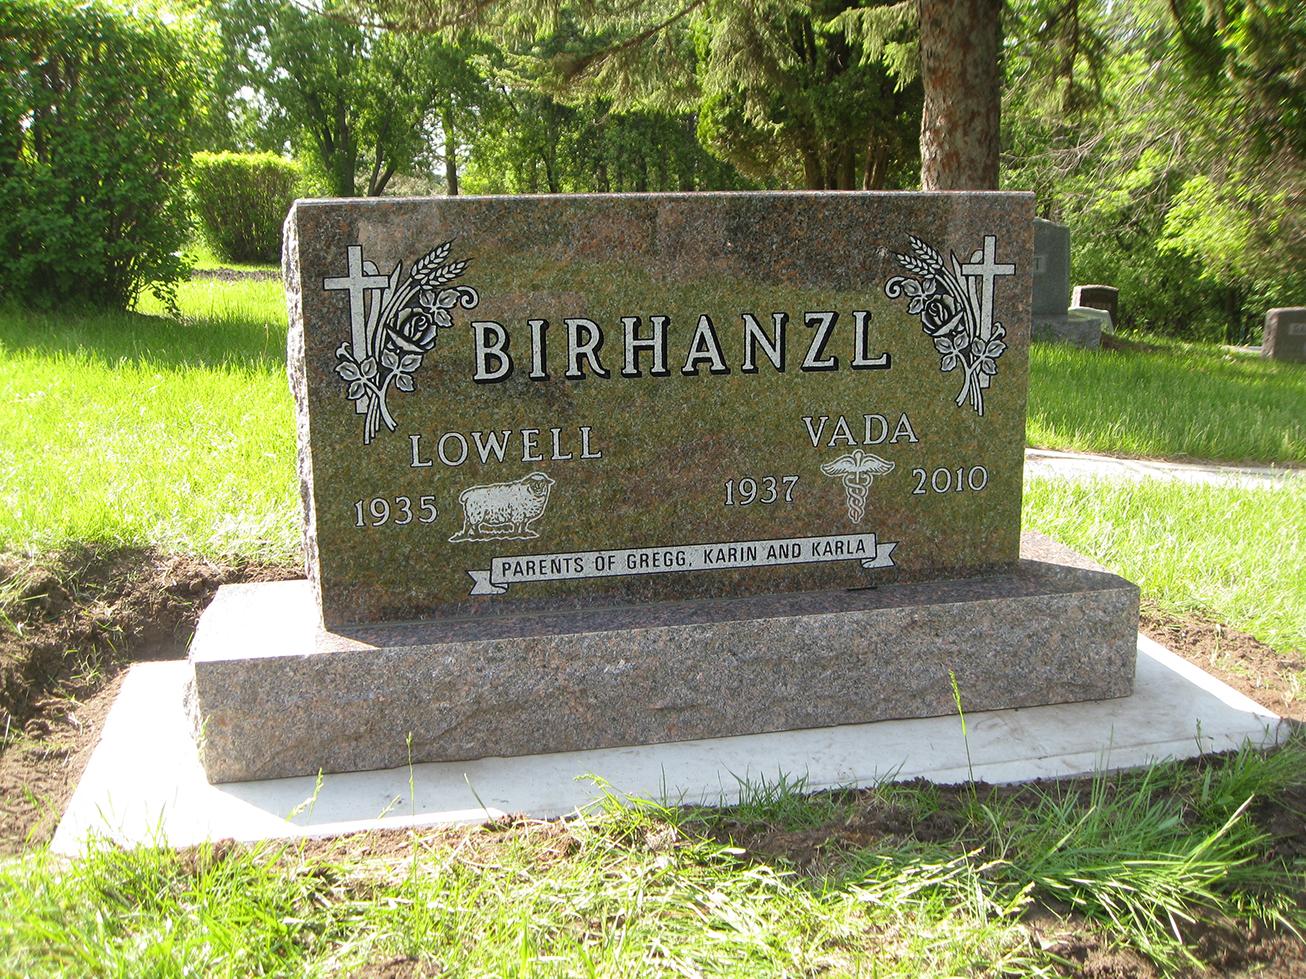 Birhanzllowell12